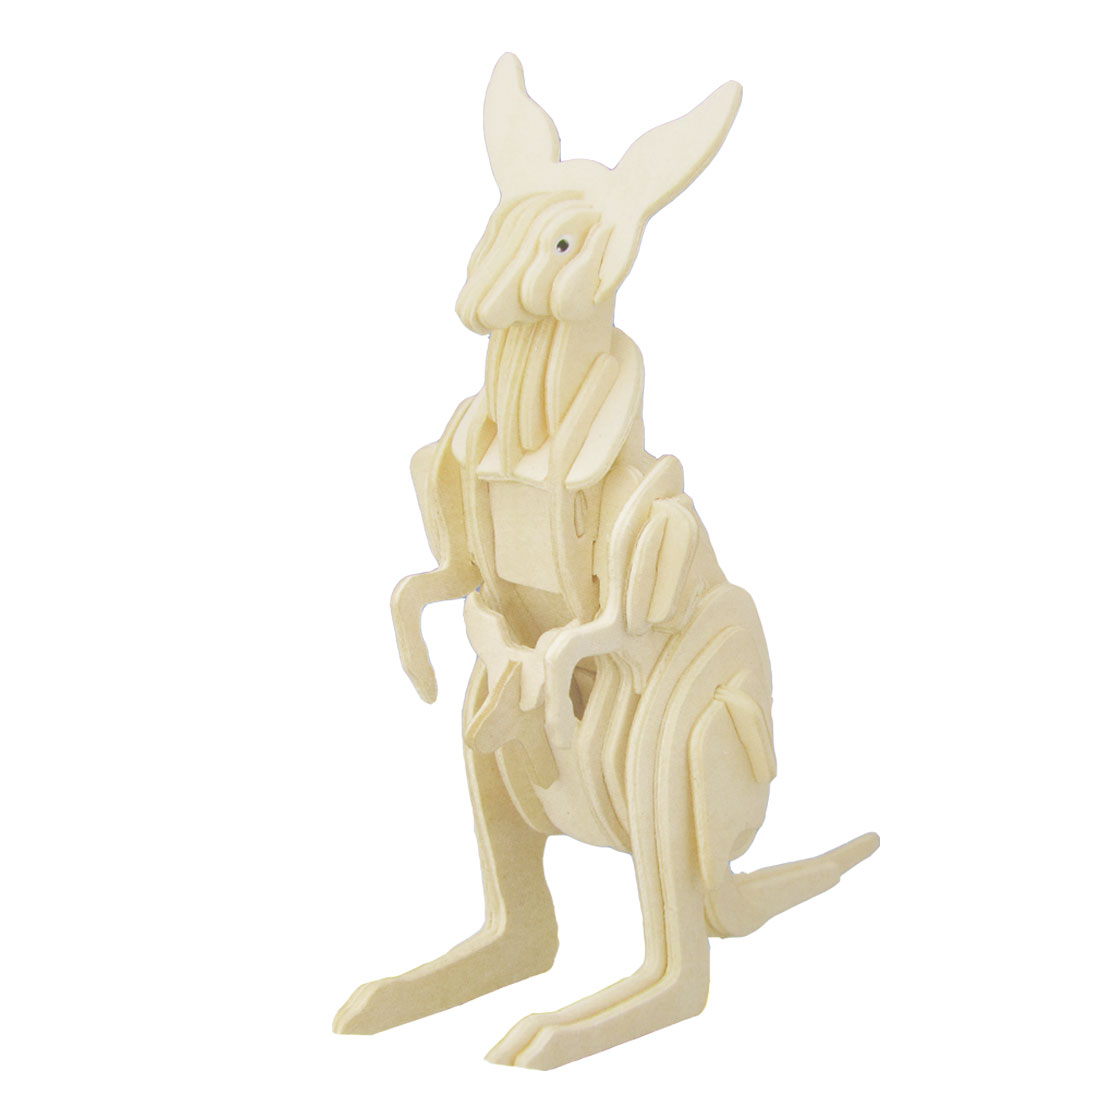 Puzzled Toy Kangaroo Model Wooden Construction Kit